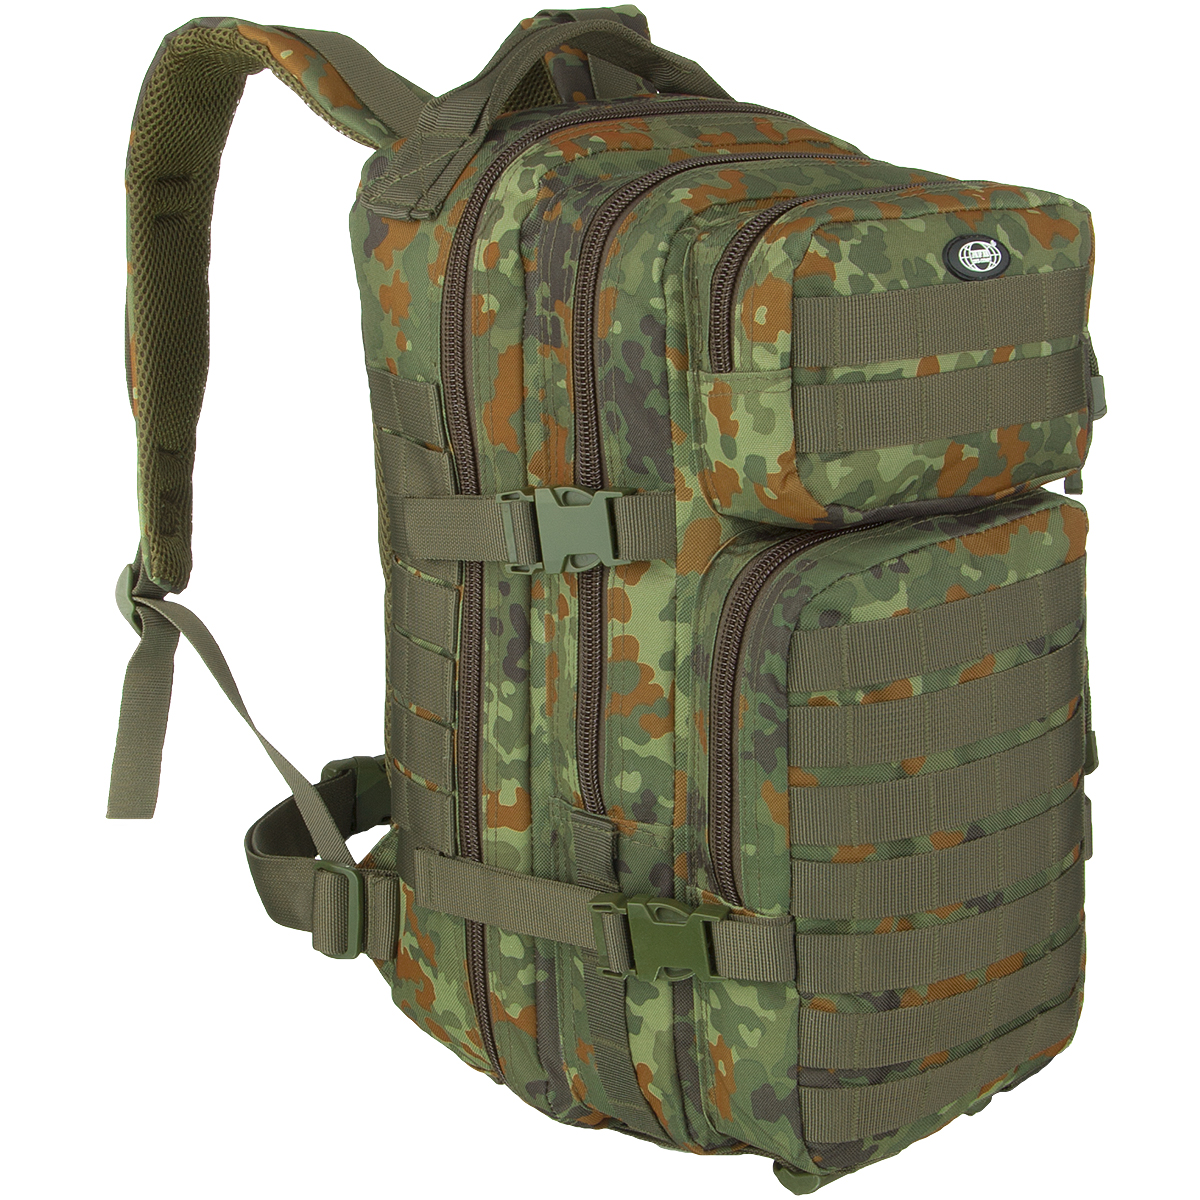 7ed92582e8a7 MFH Combat Waist Bag Flecktarn Needed for camping t